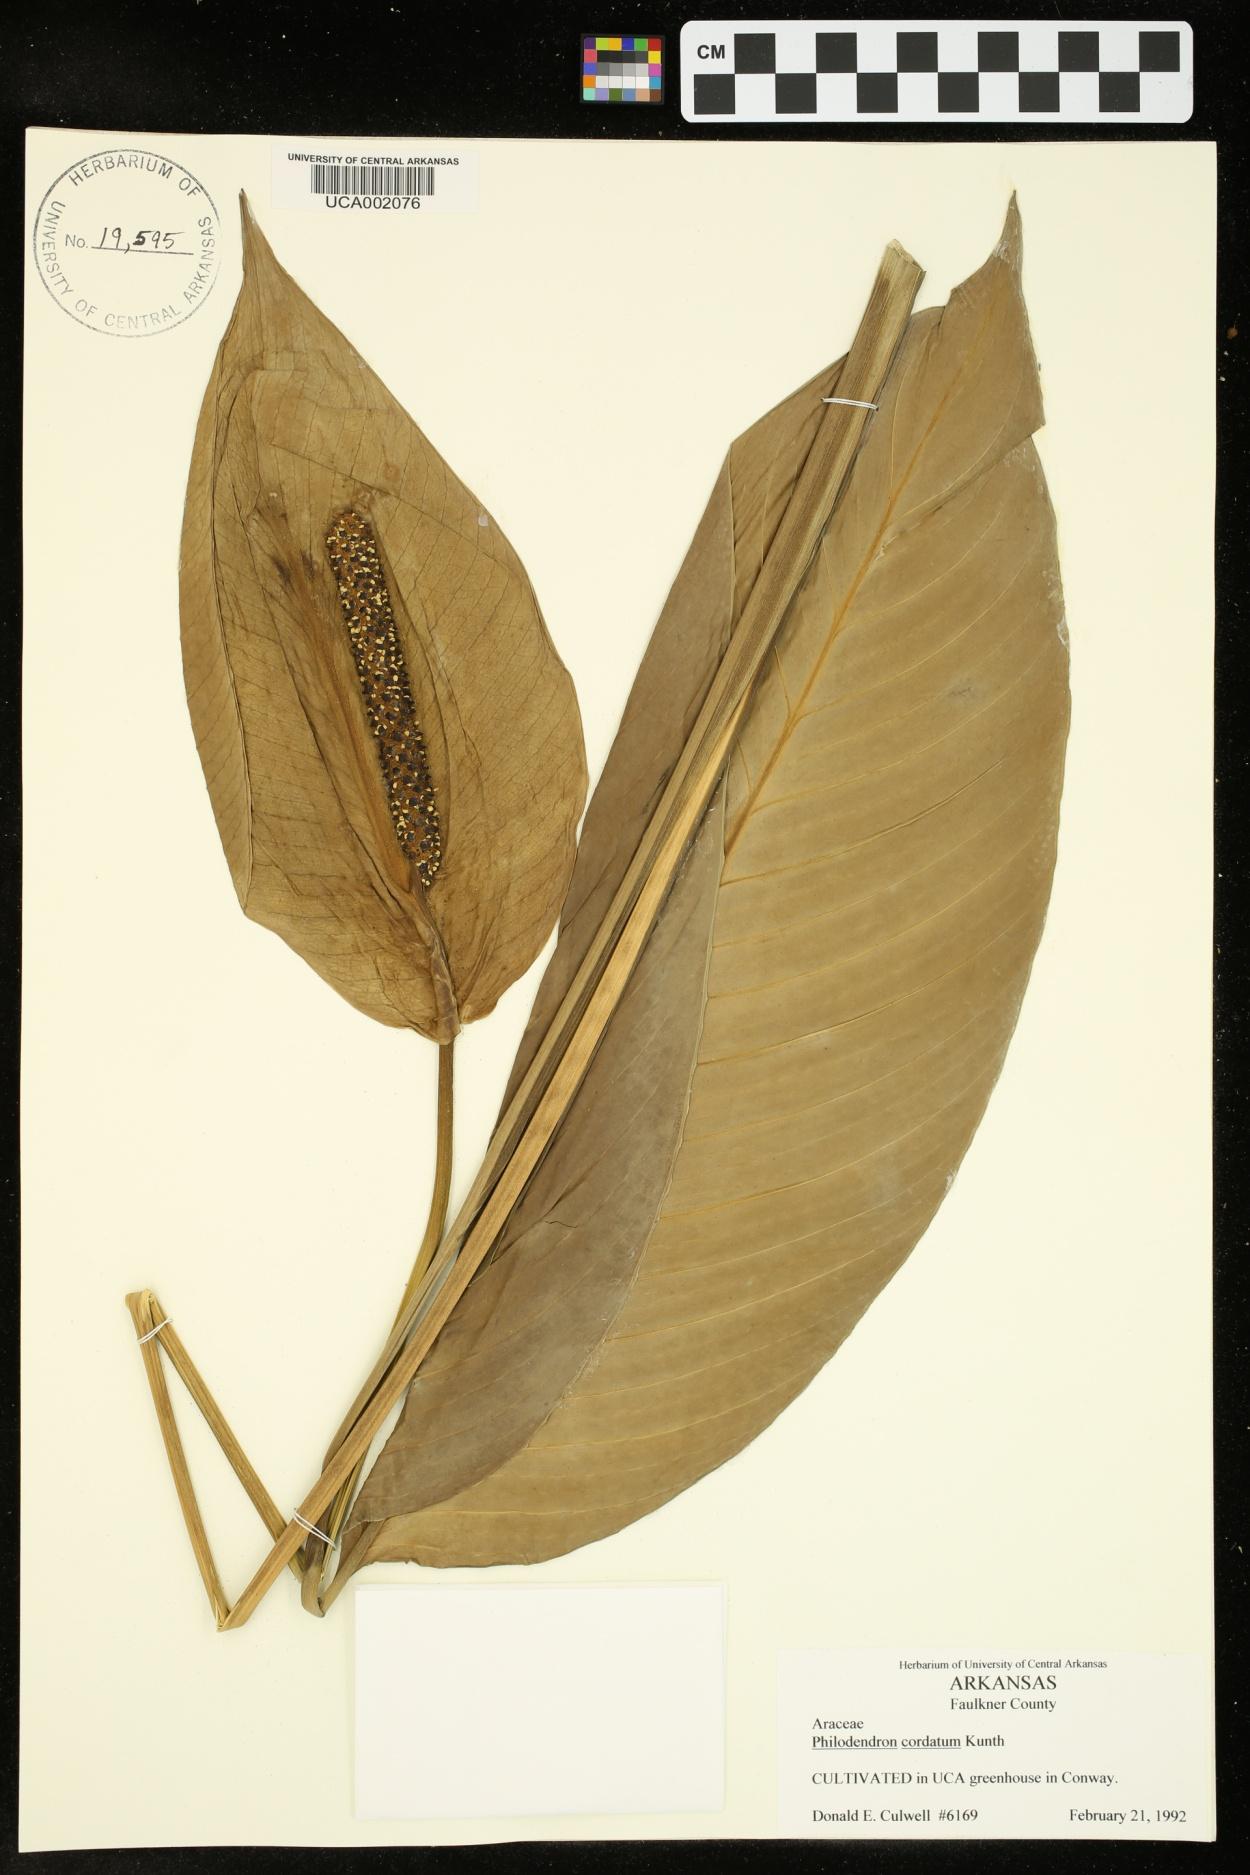 Philodendron cordatum image